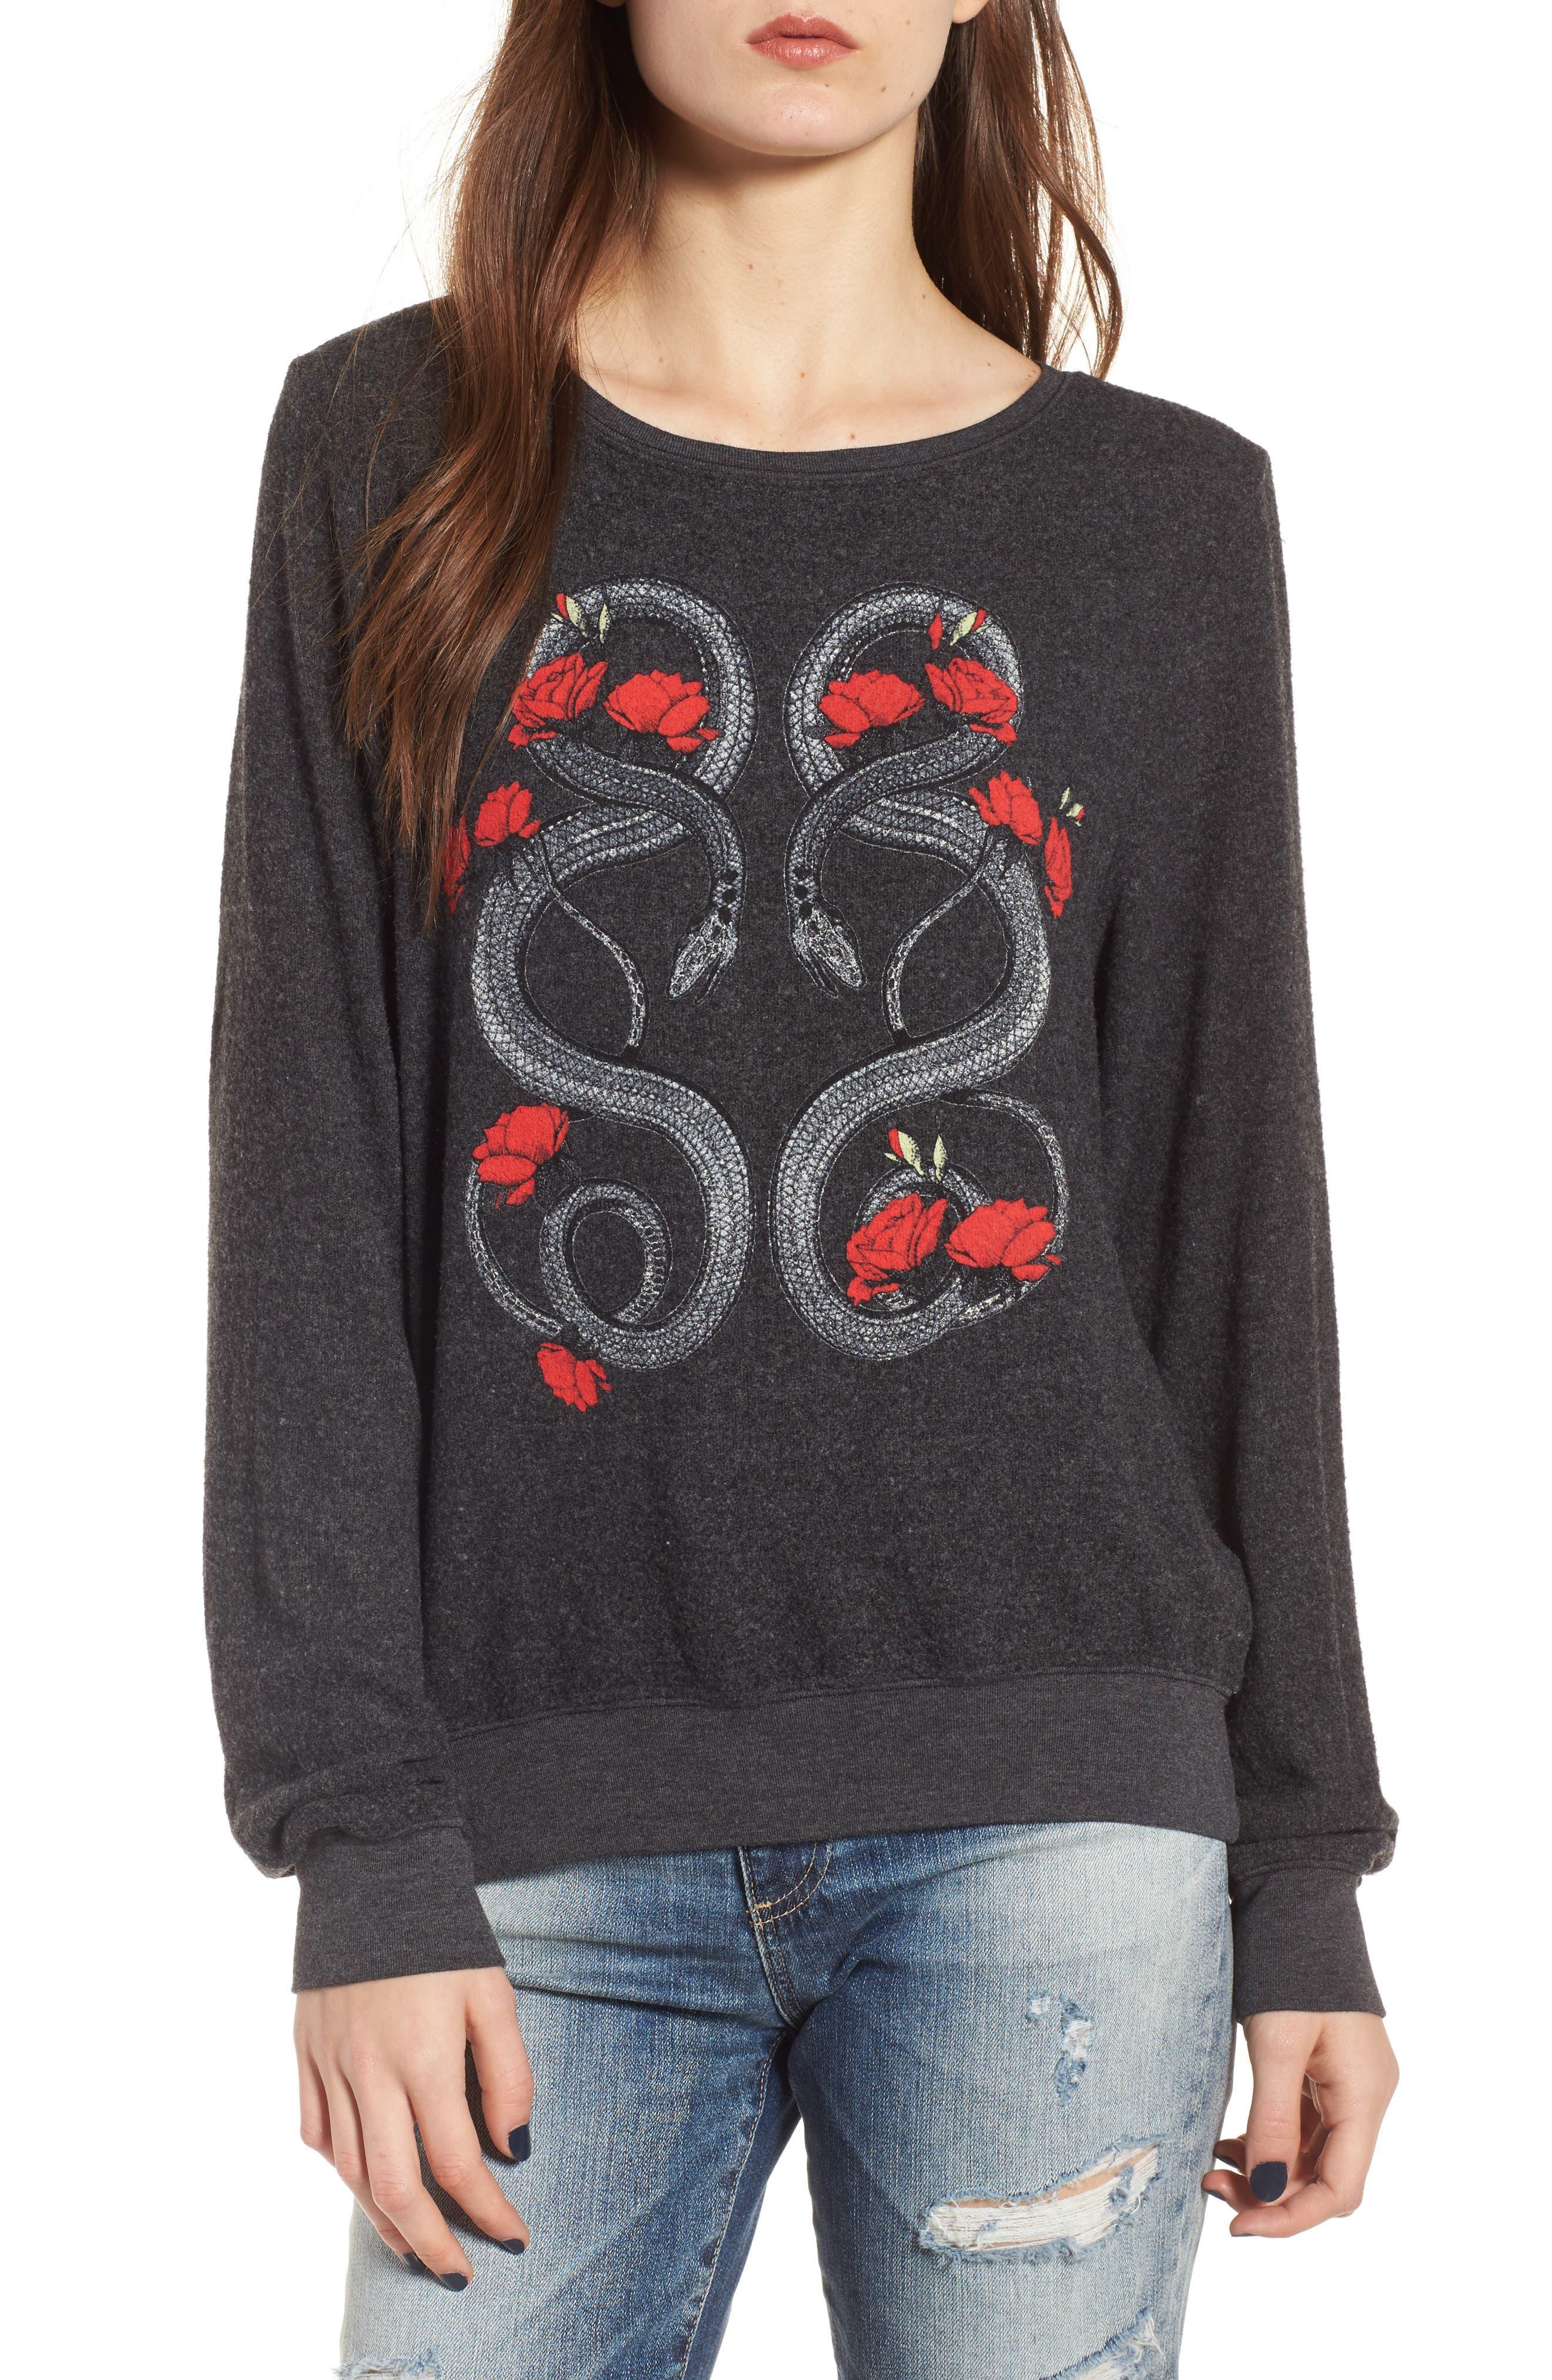 Dream Scene Red Snakes Sweatshirt